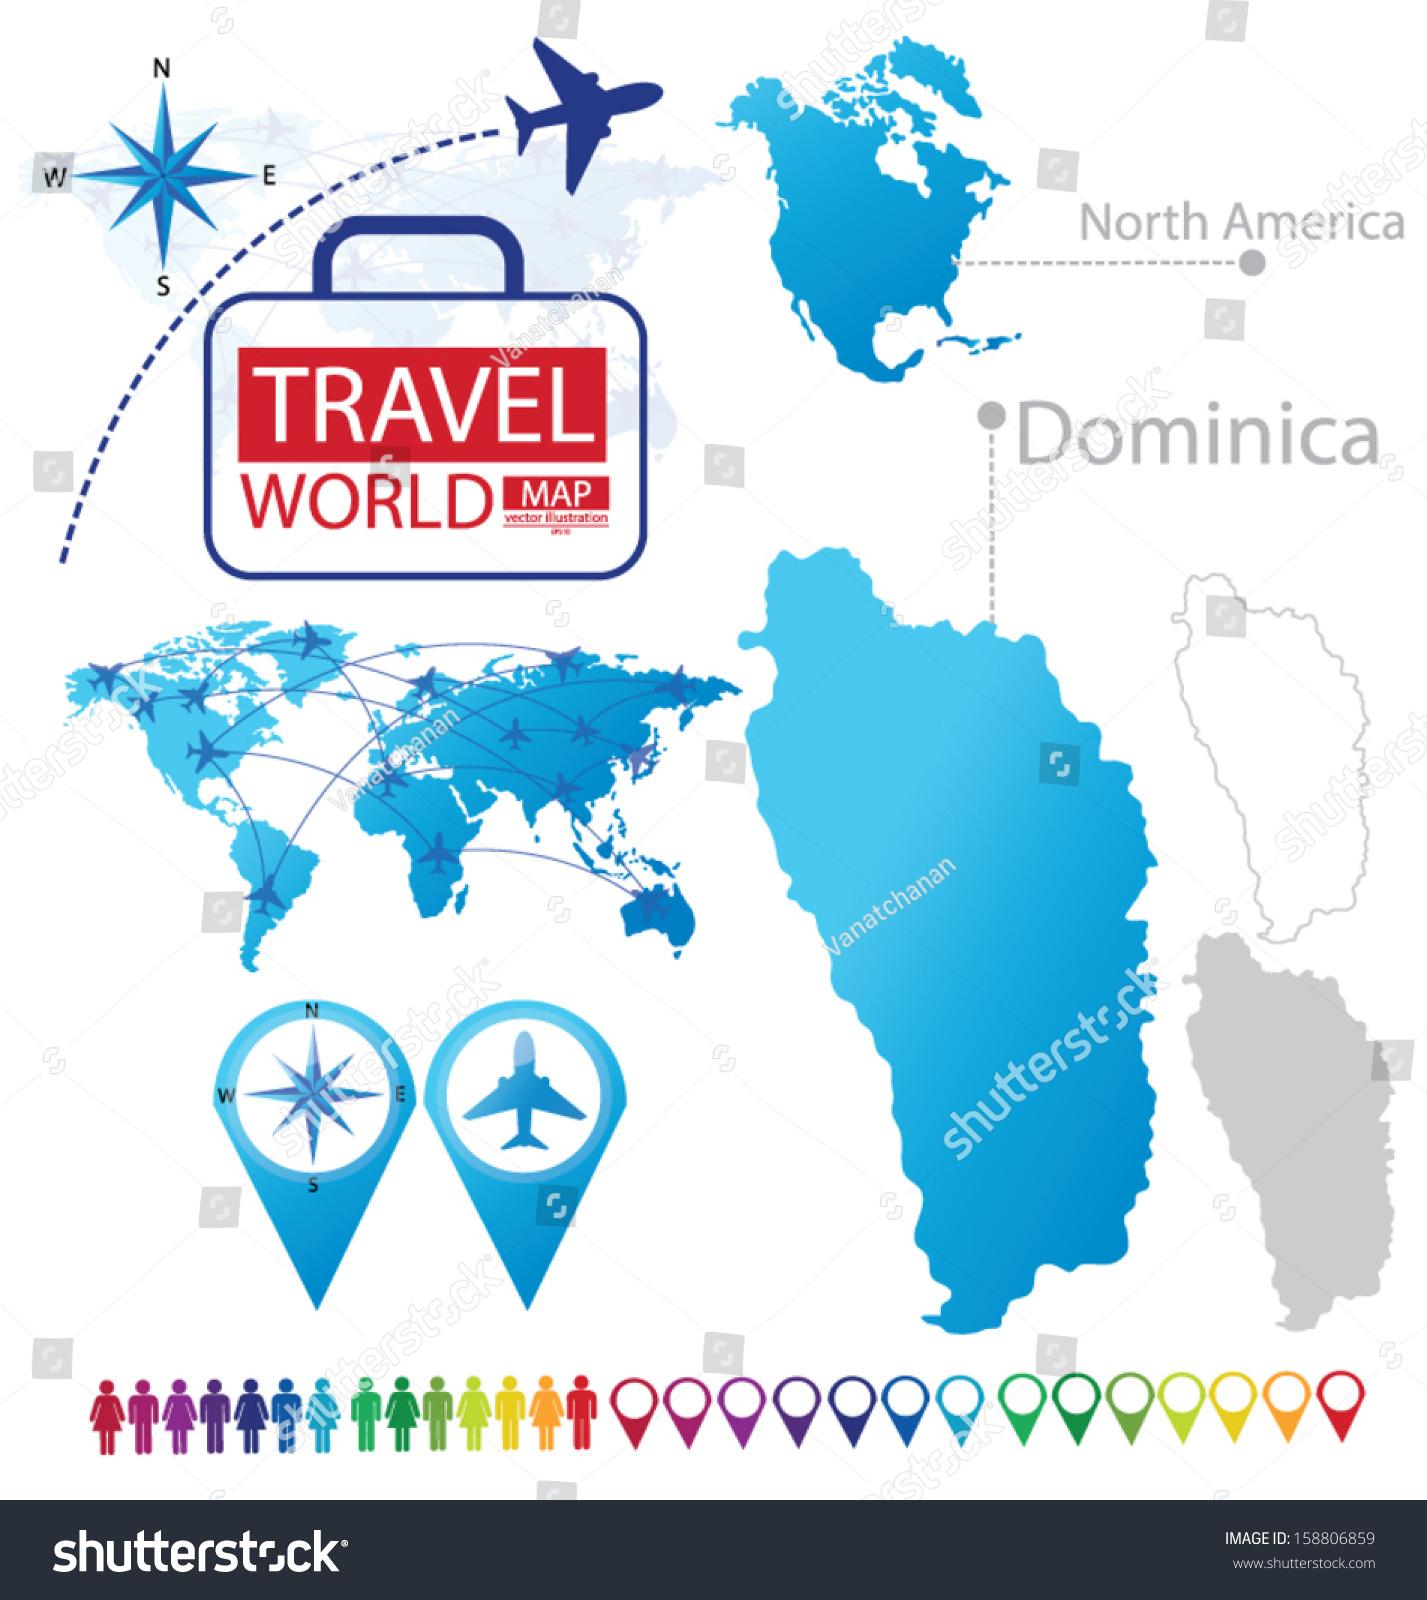 Vector De Stock Libre De Regalias Sobre Commonwealth Dominica North America World Map158806859